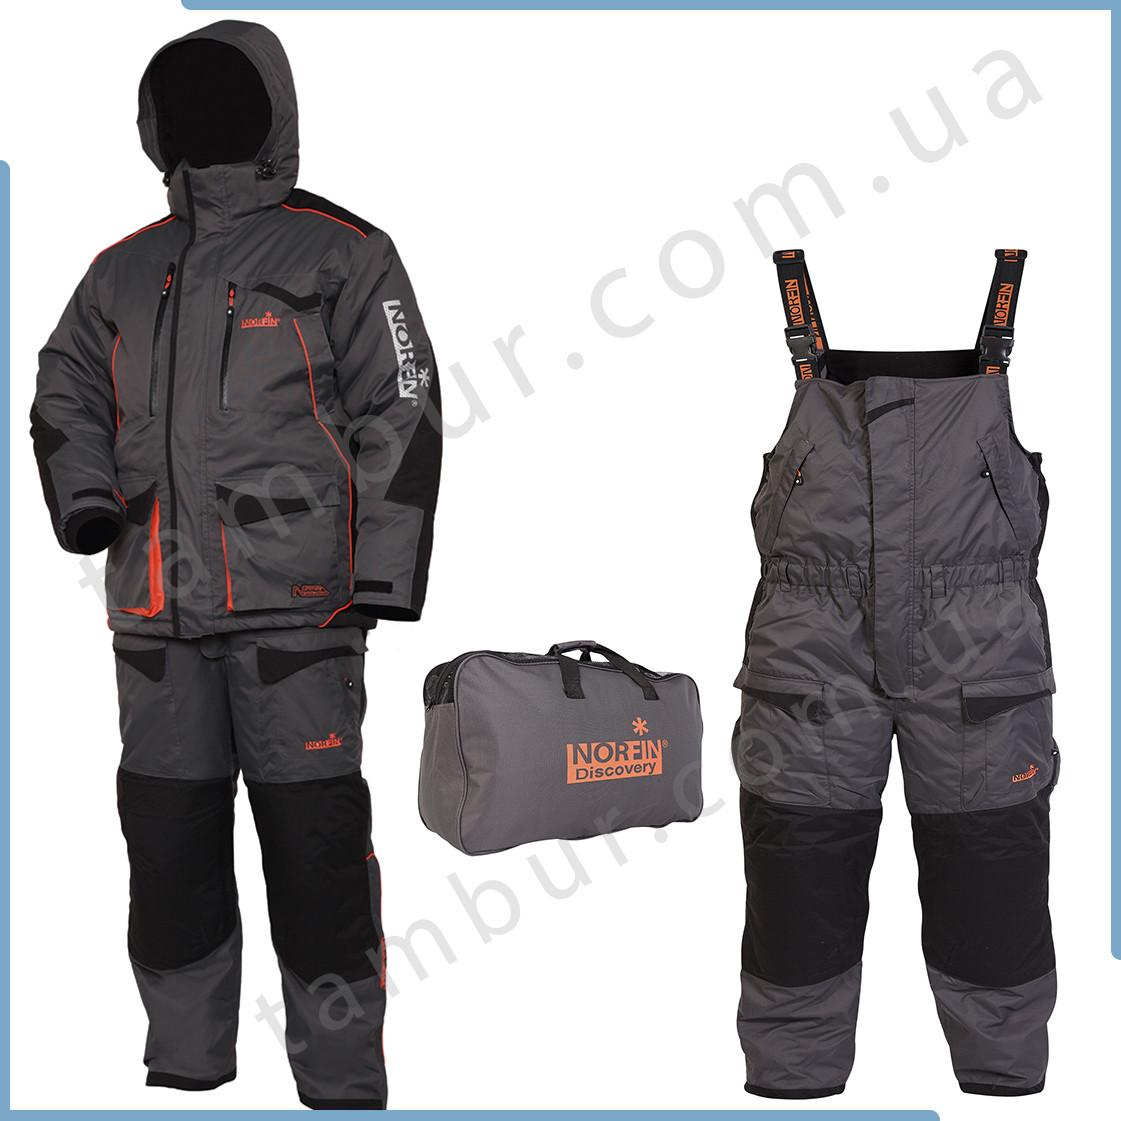 Зимний костюм Norfin Discovery Gray -35°C (обновлённый)